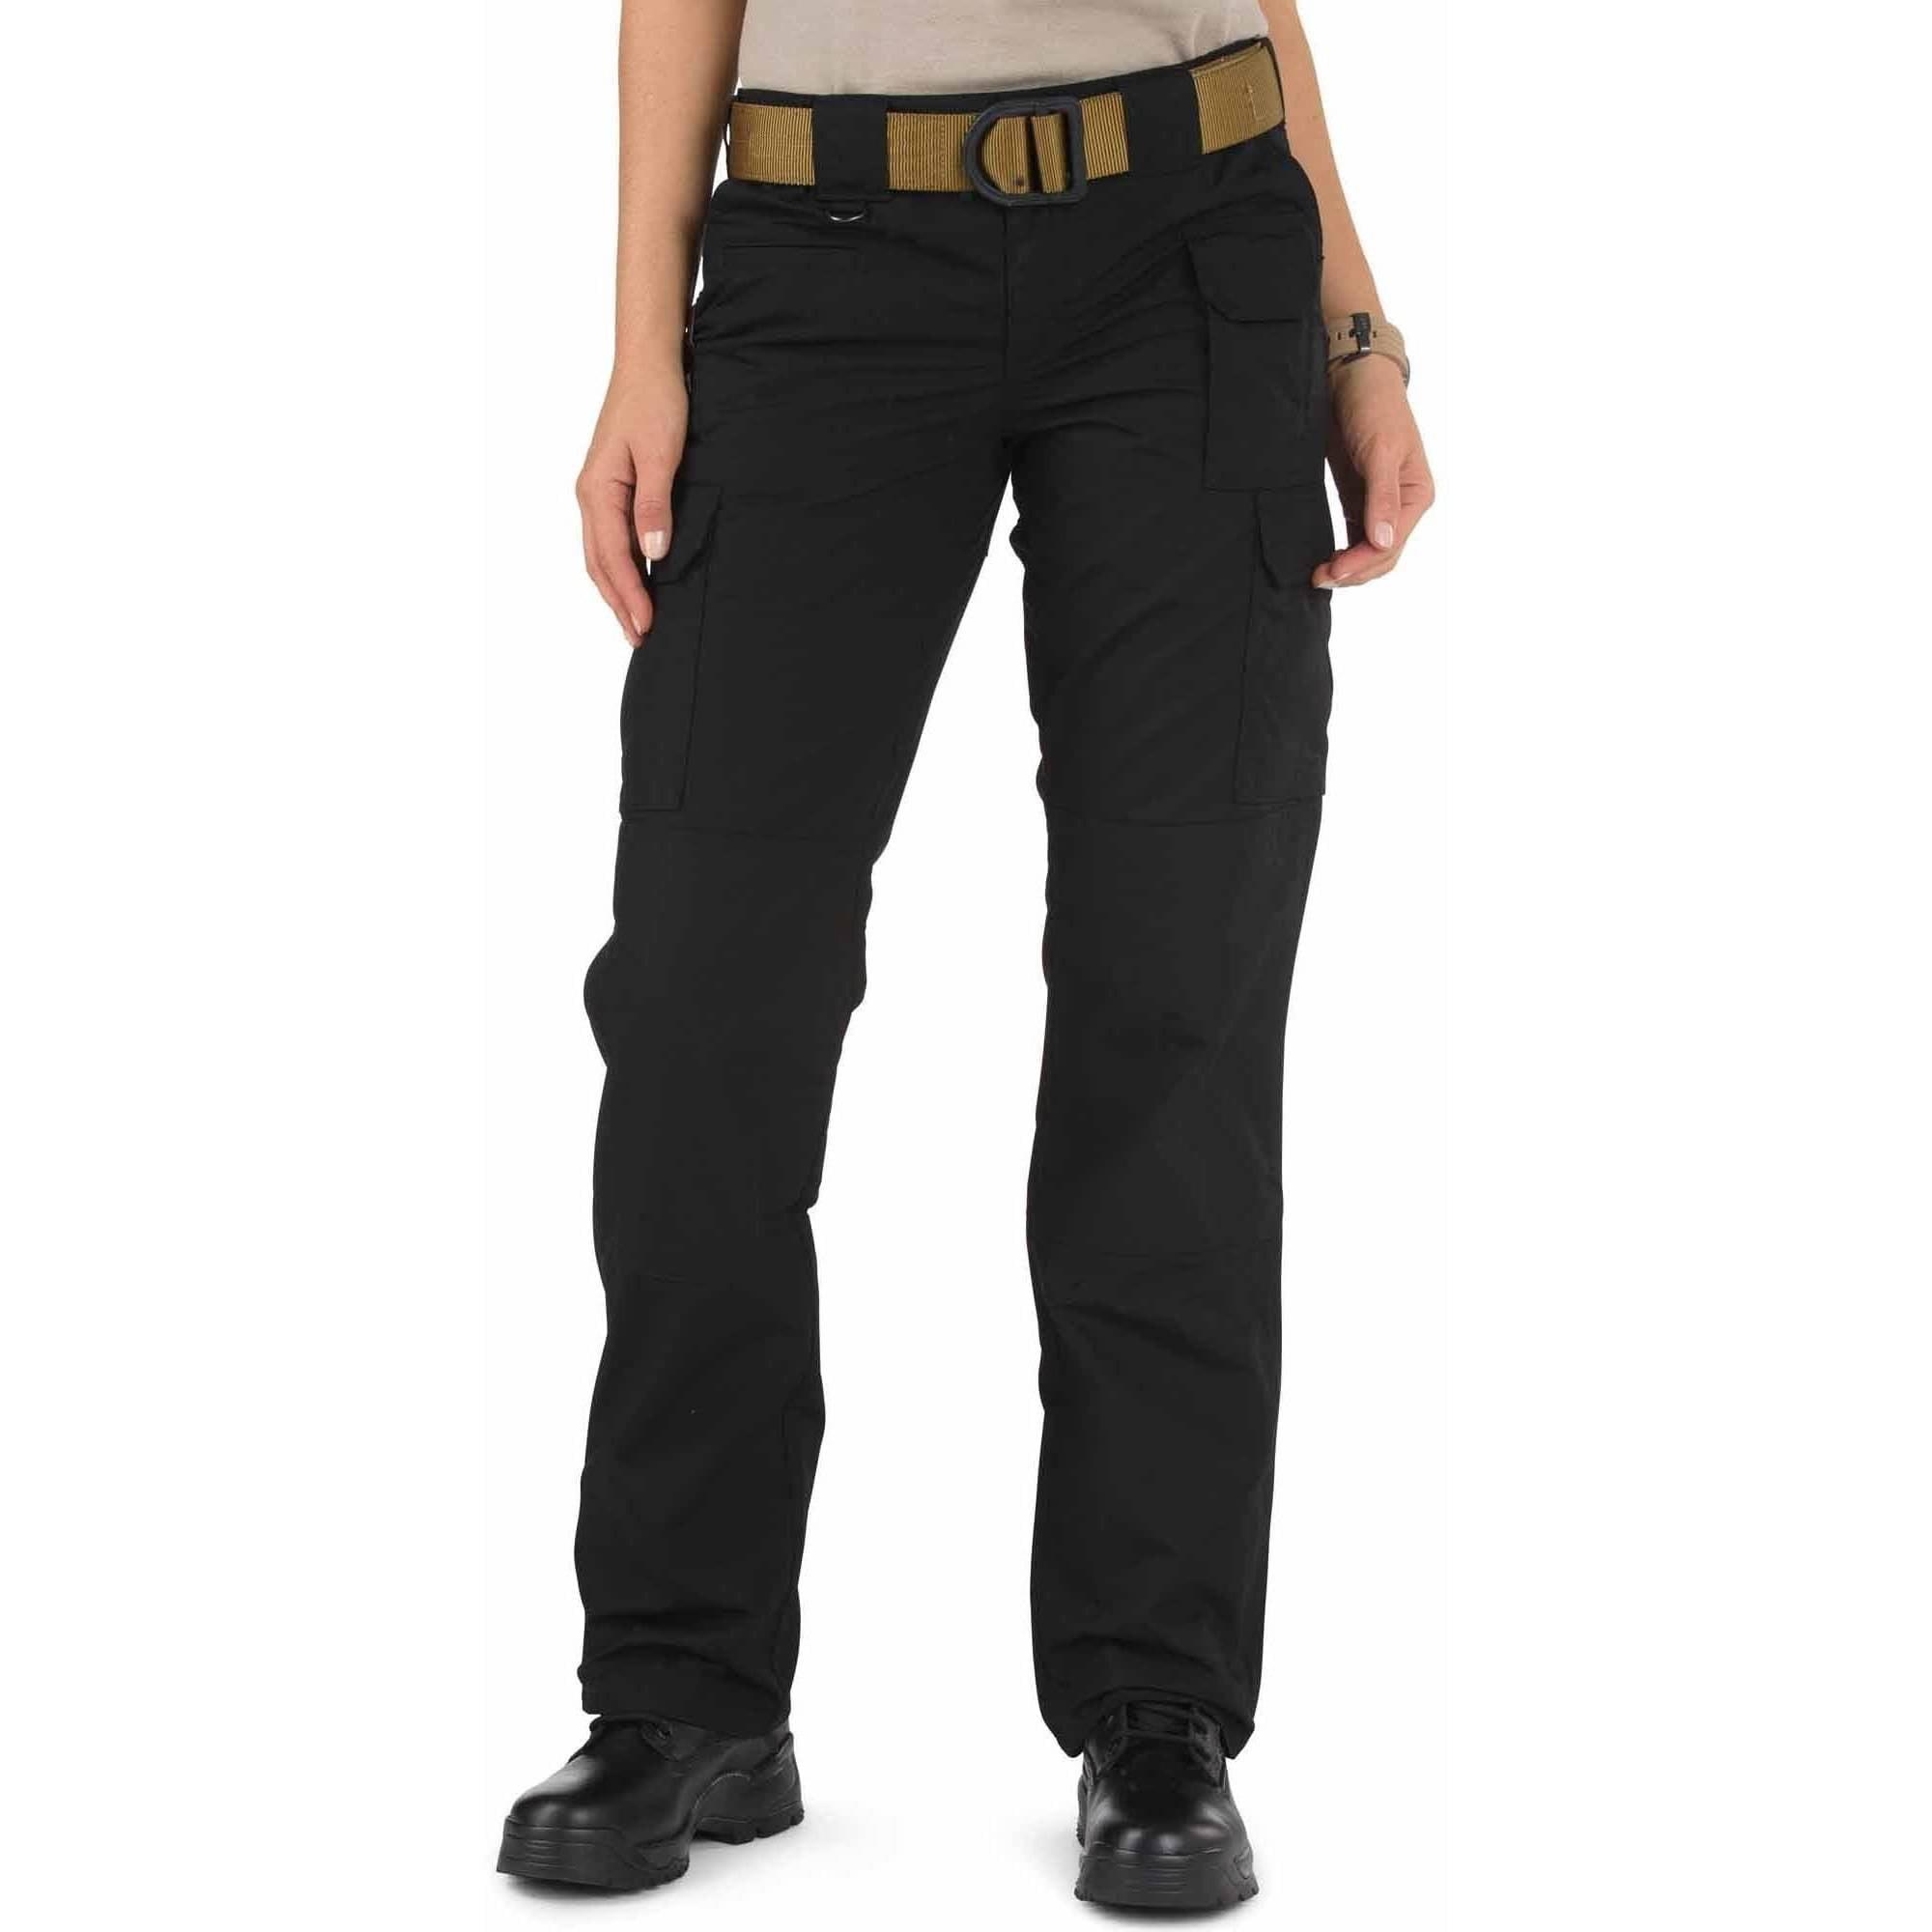 5.11 Women's Taclite Pant, Black, 4 Long